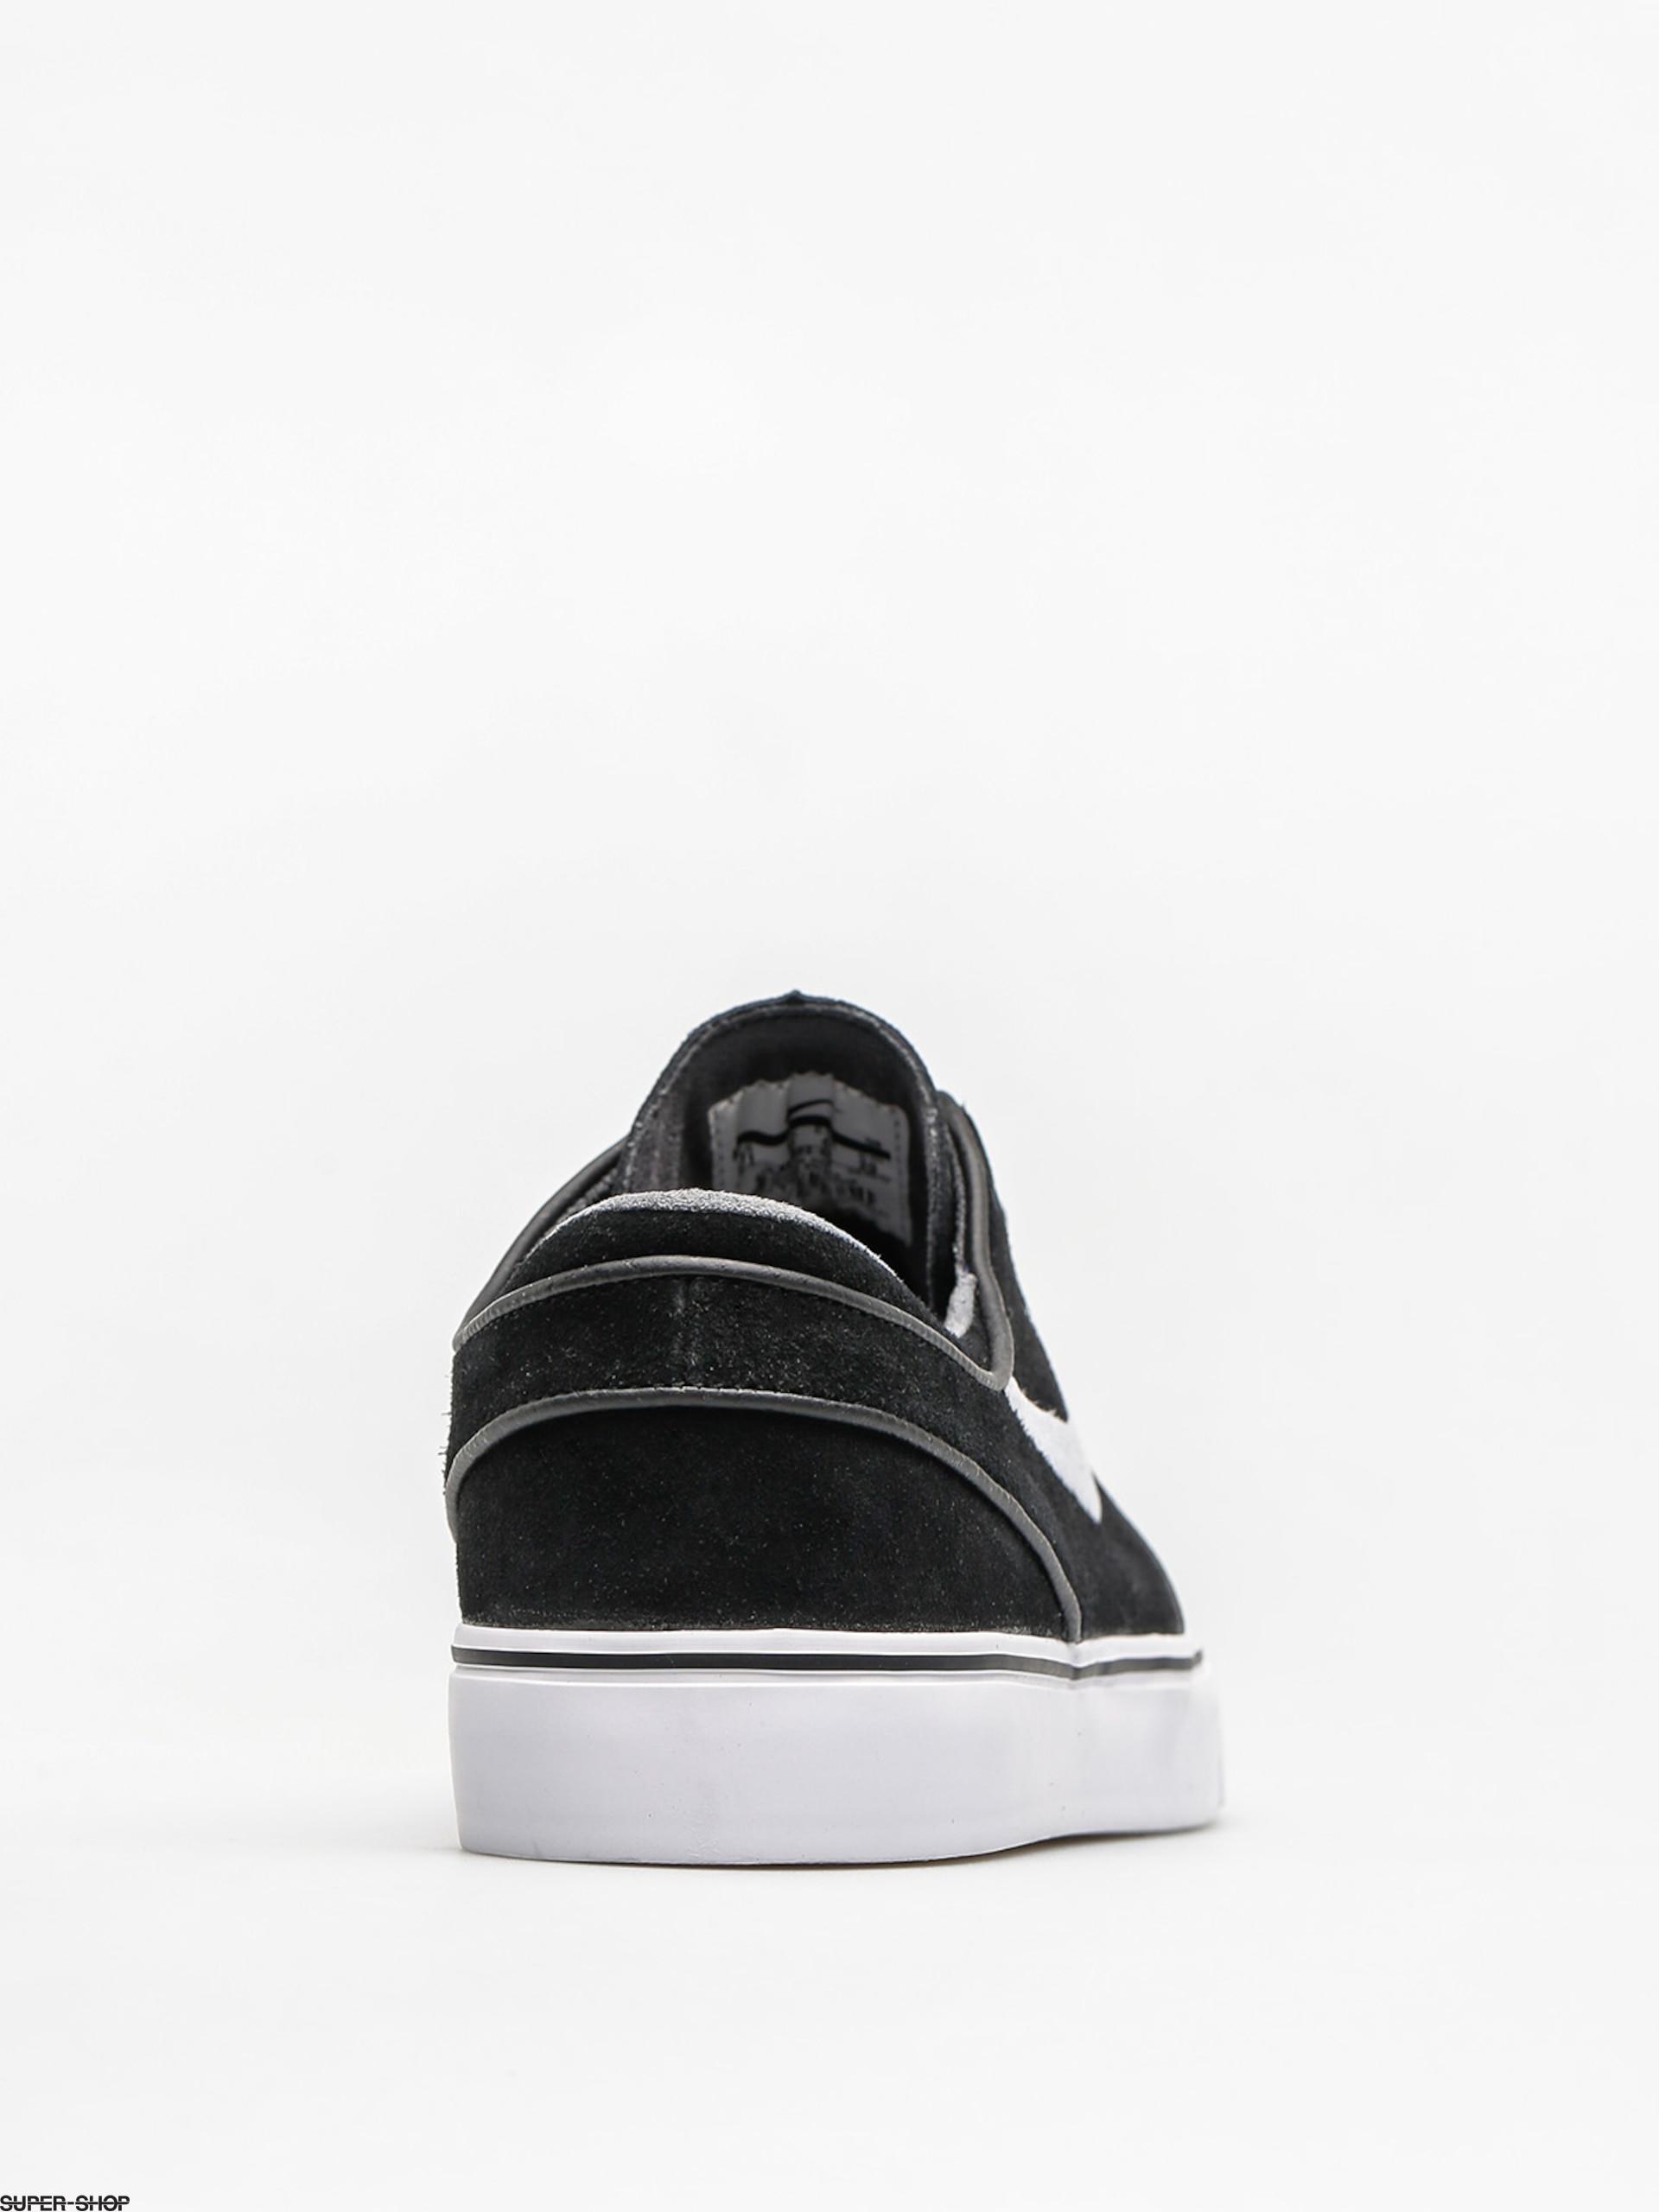 fa47f11185b17 Nike SB Shoes Zoom Stefan Janoski Og (black white gum light brown)